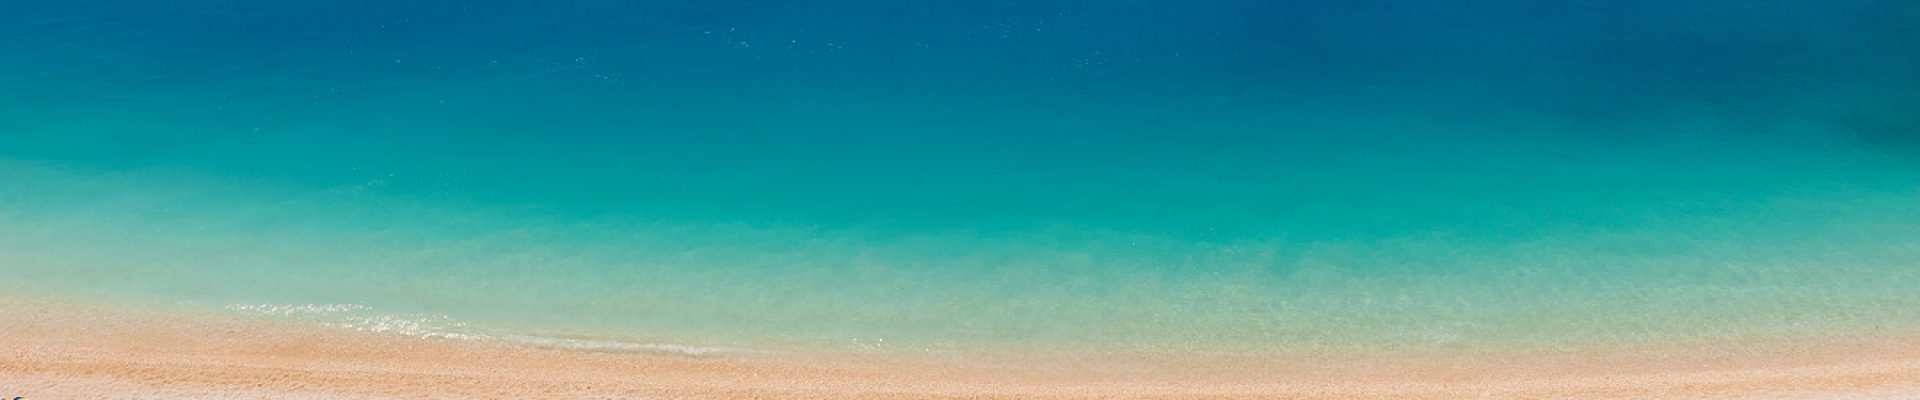 MW-IB353_Beach_ZG_20200303114620.jpg